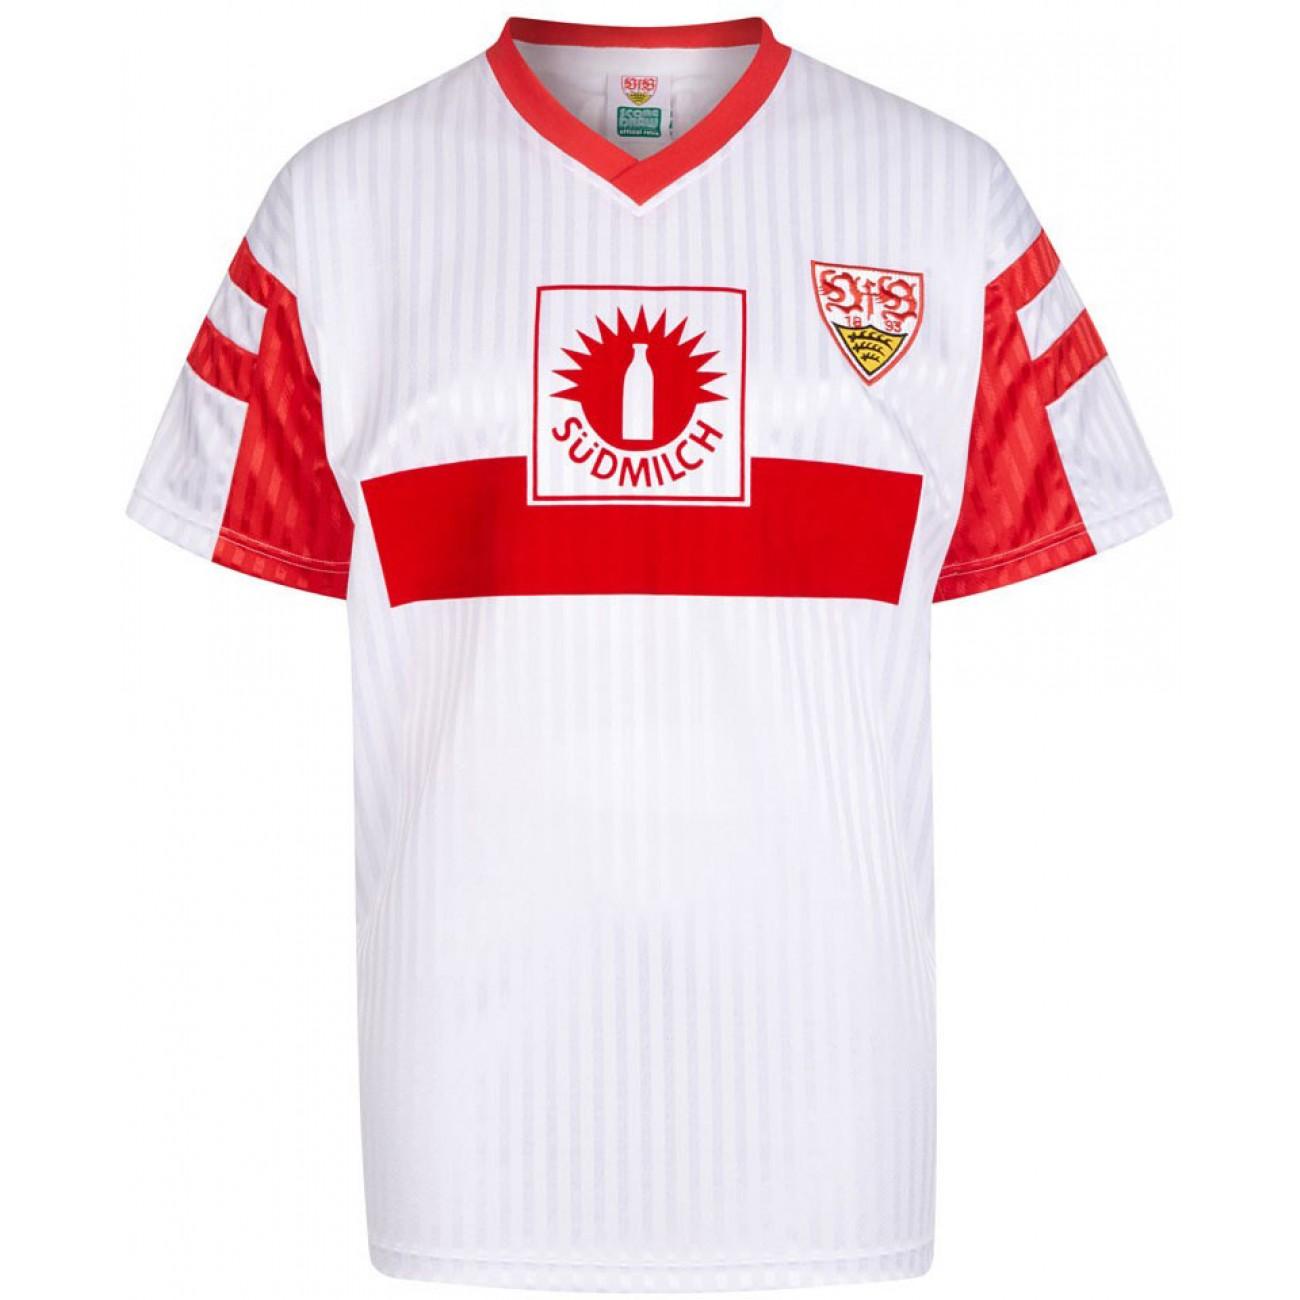 66c39f1d Retro Uk Football Shirts - DREAMWORKS